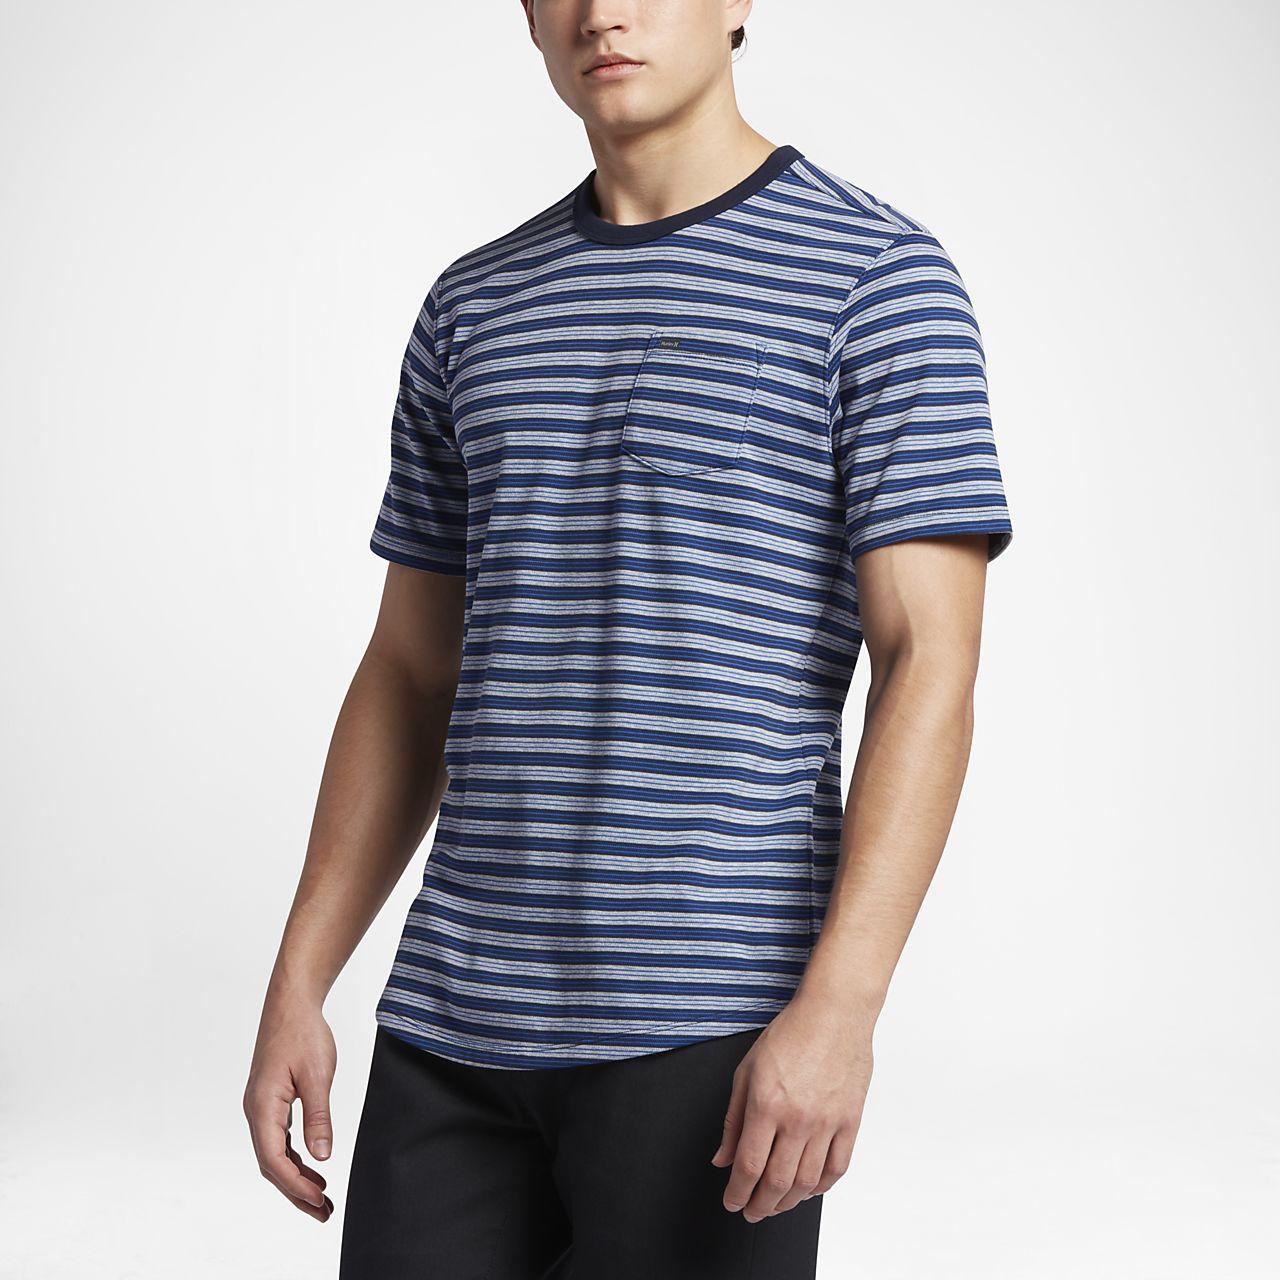 Nike Mens T-Shirt - Nike Hurley Staple Crew Black Heather S52m4631